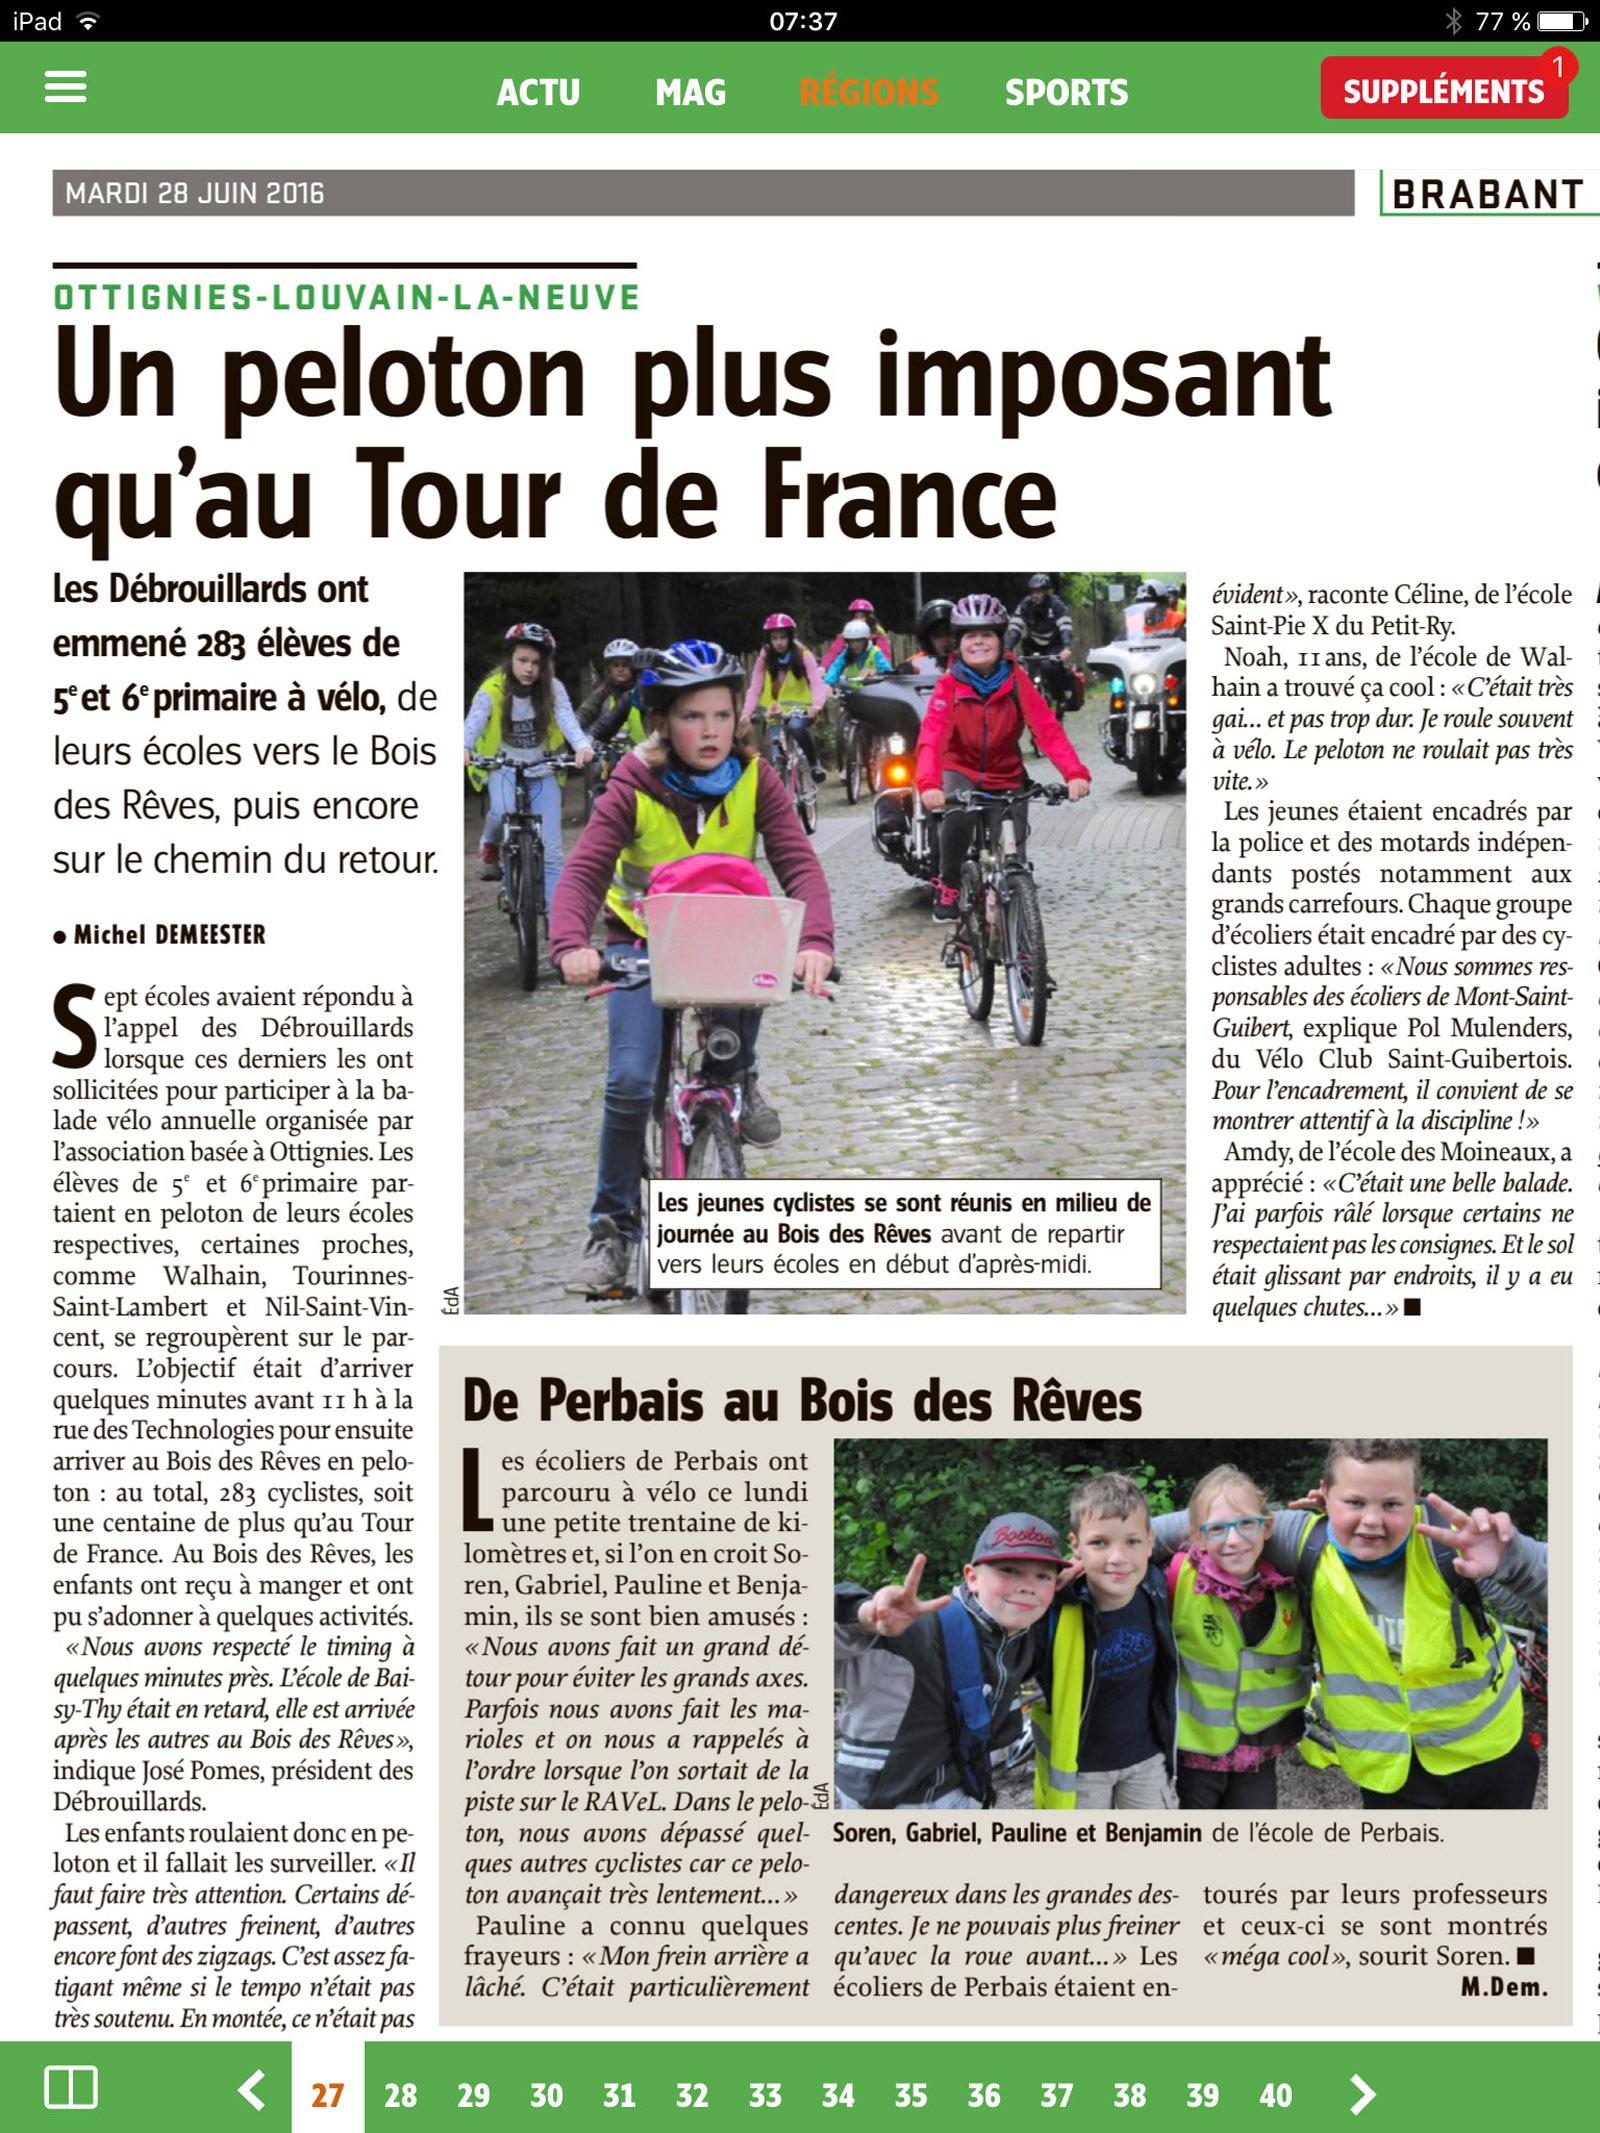 Eleves_de_Perbais_au_Bois_des_Reves_600__0691.jpg